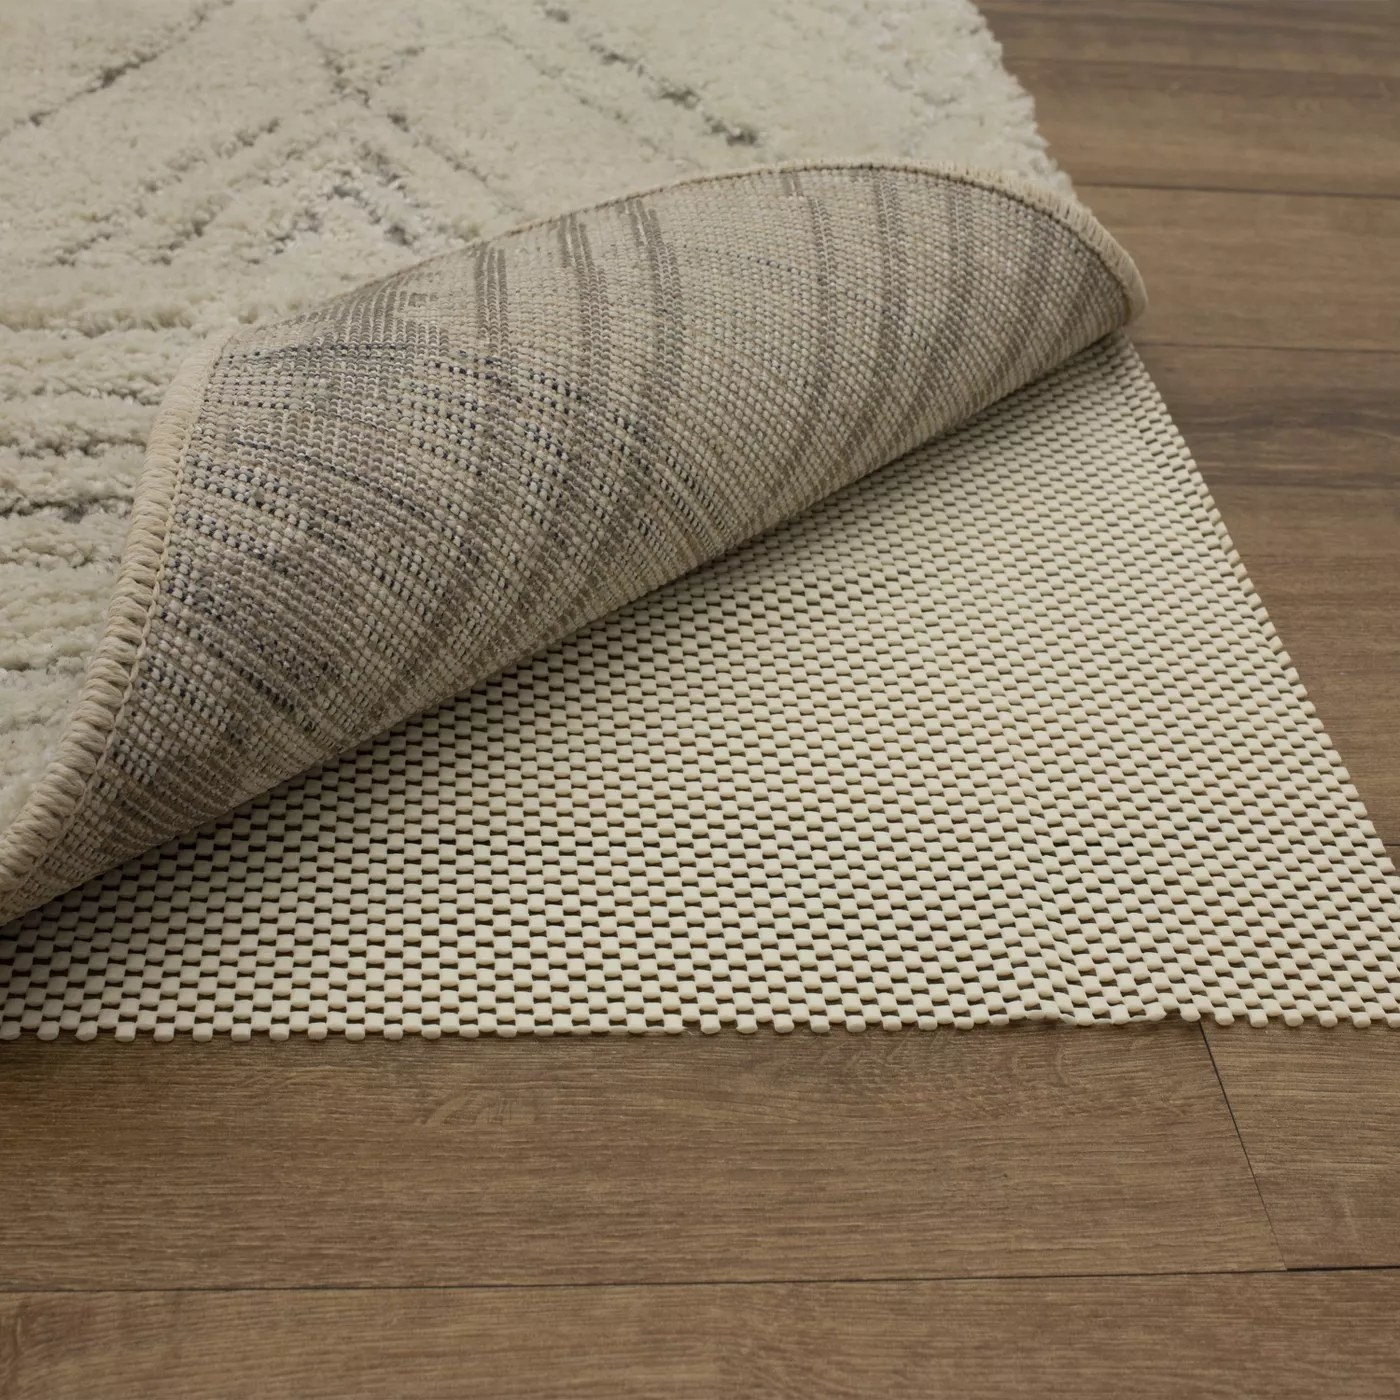 A carpet grip pad